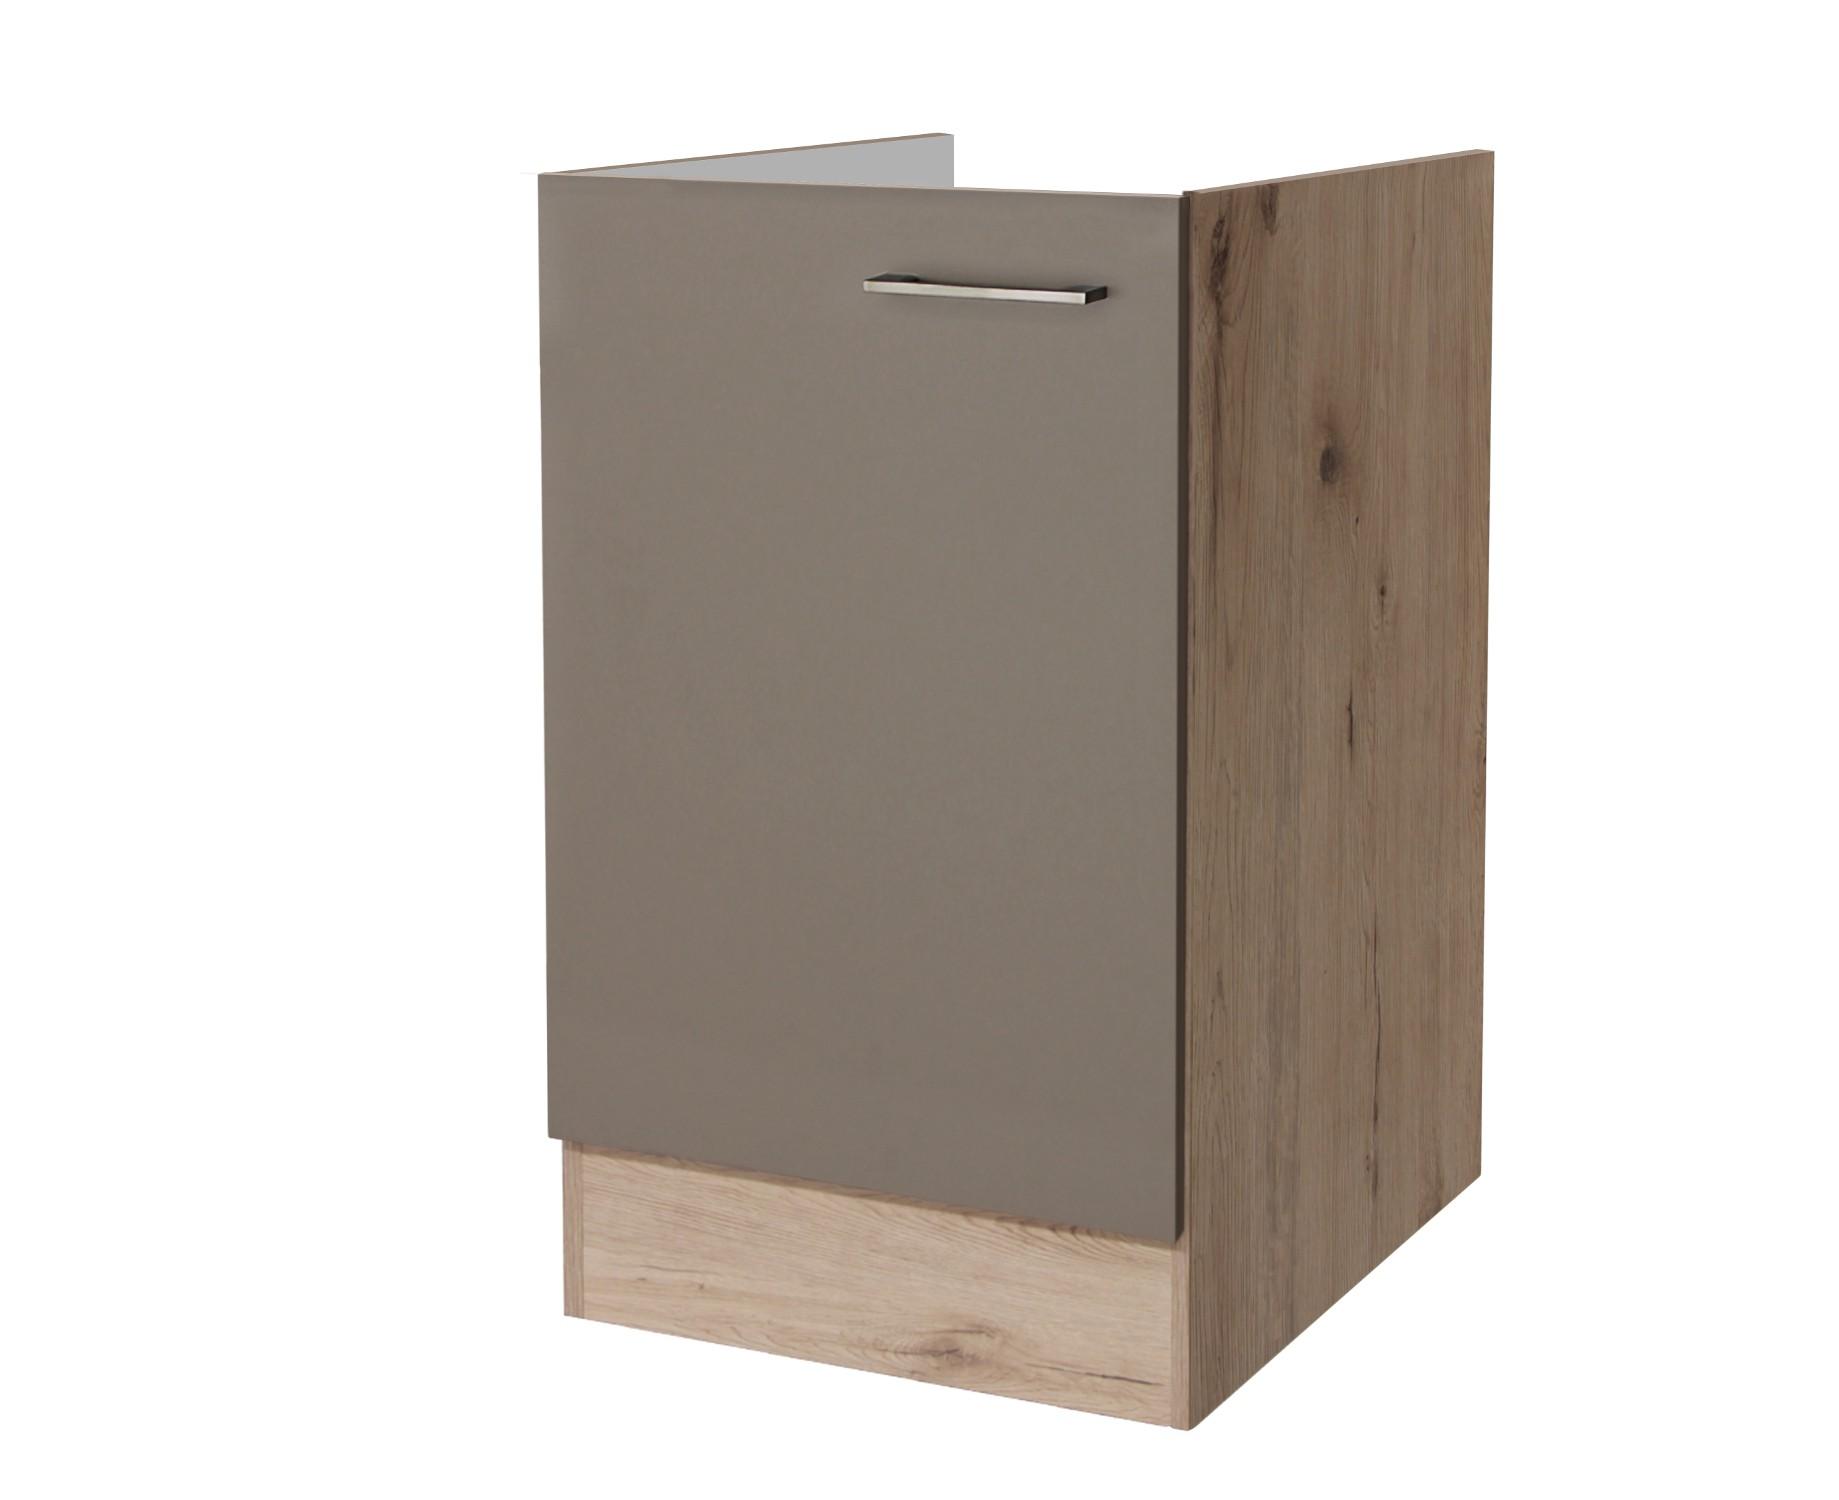 nobilia k chen riva flash 455 seidengrau hochglanz moderne k chen nobilia. Black Bedroom Furniture Sets. Home Design Ideas